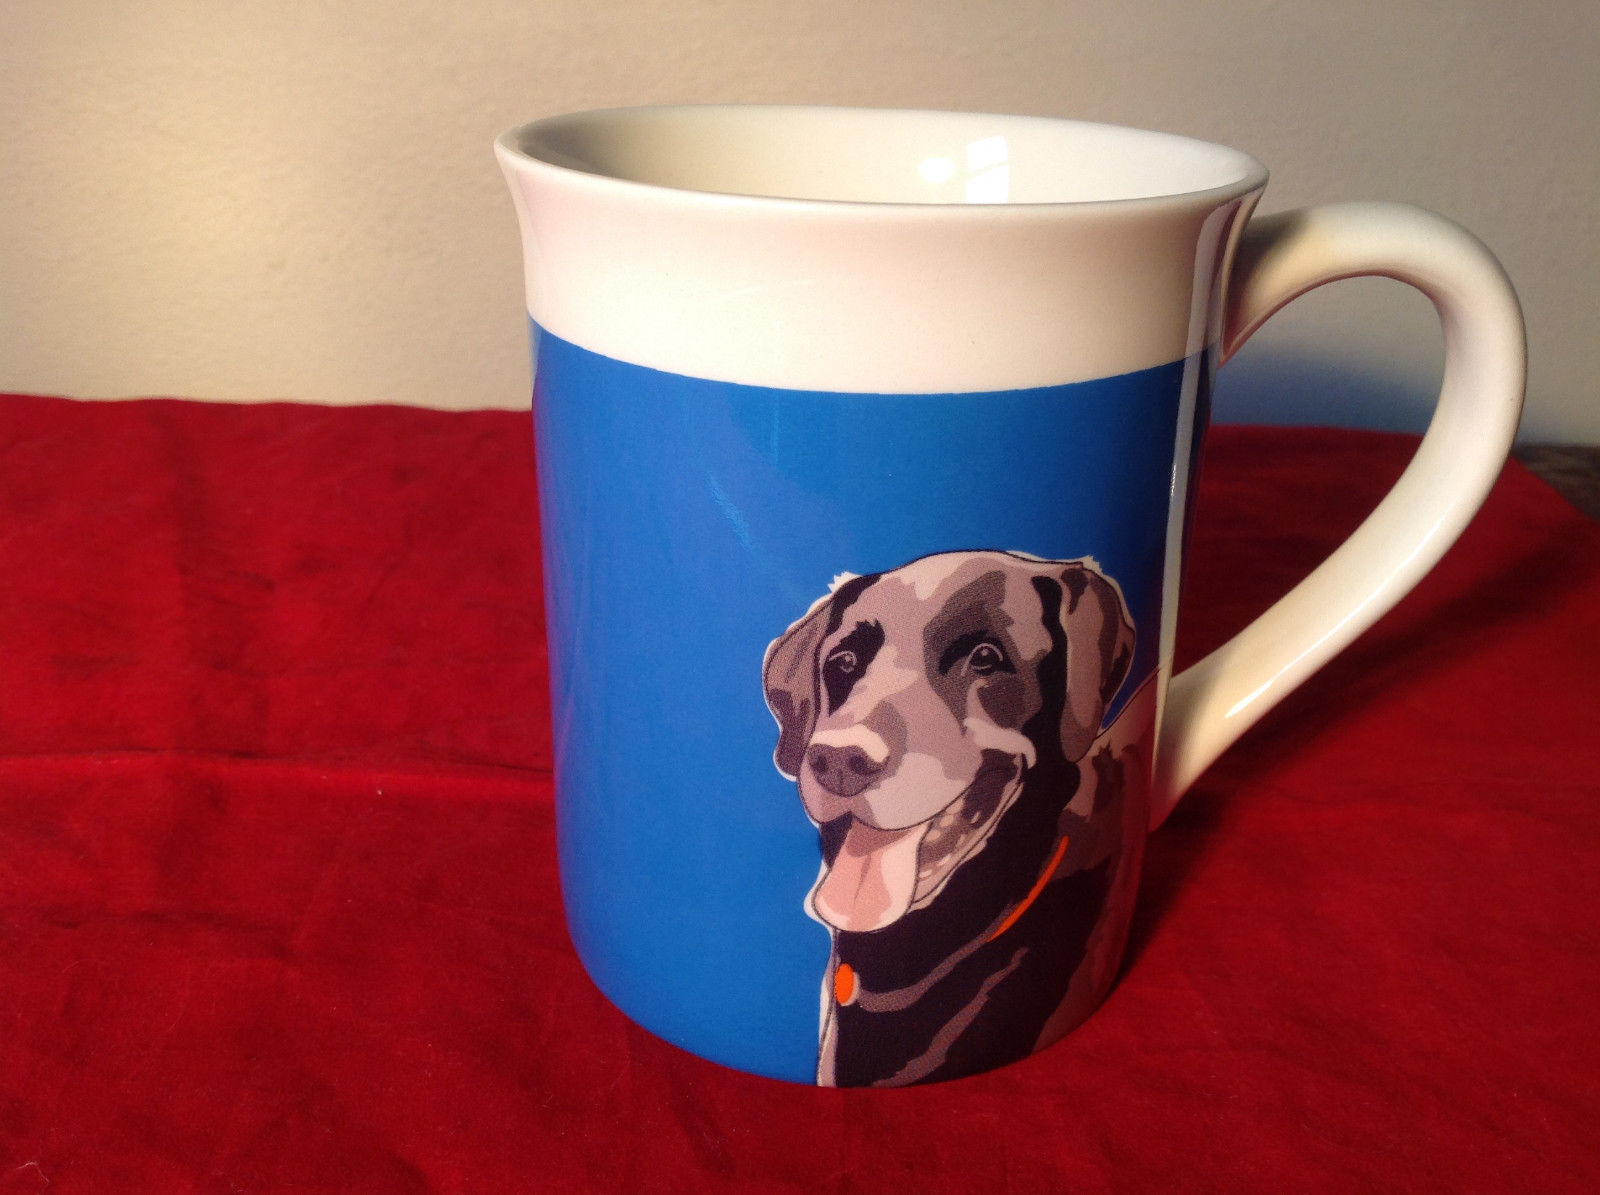 Go Dog Black Lab Mug by Paper Russells w Original Box 16 ounces Department 56